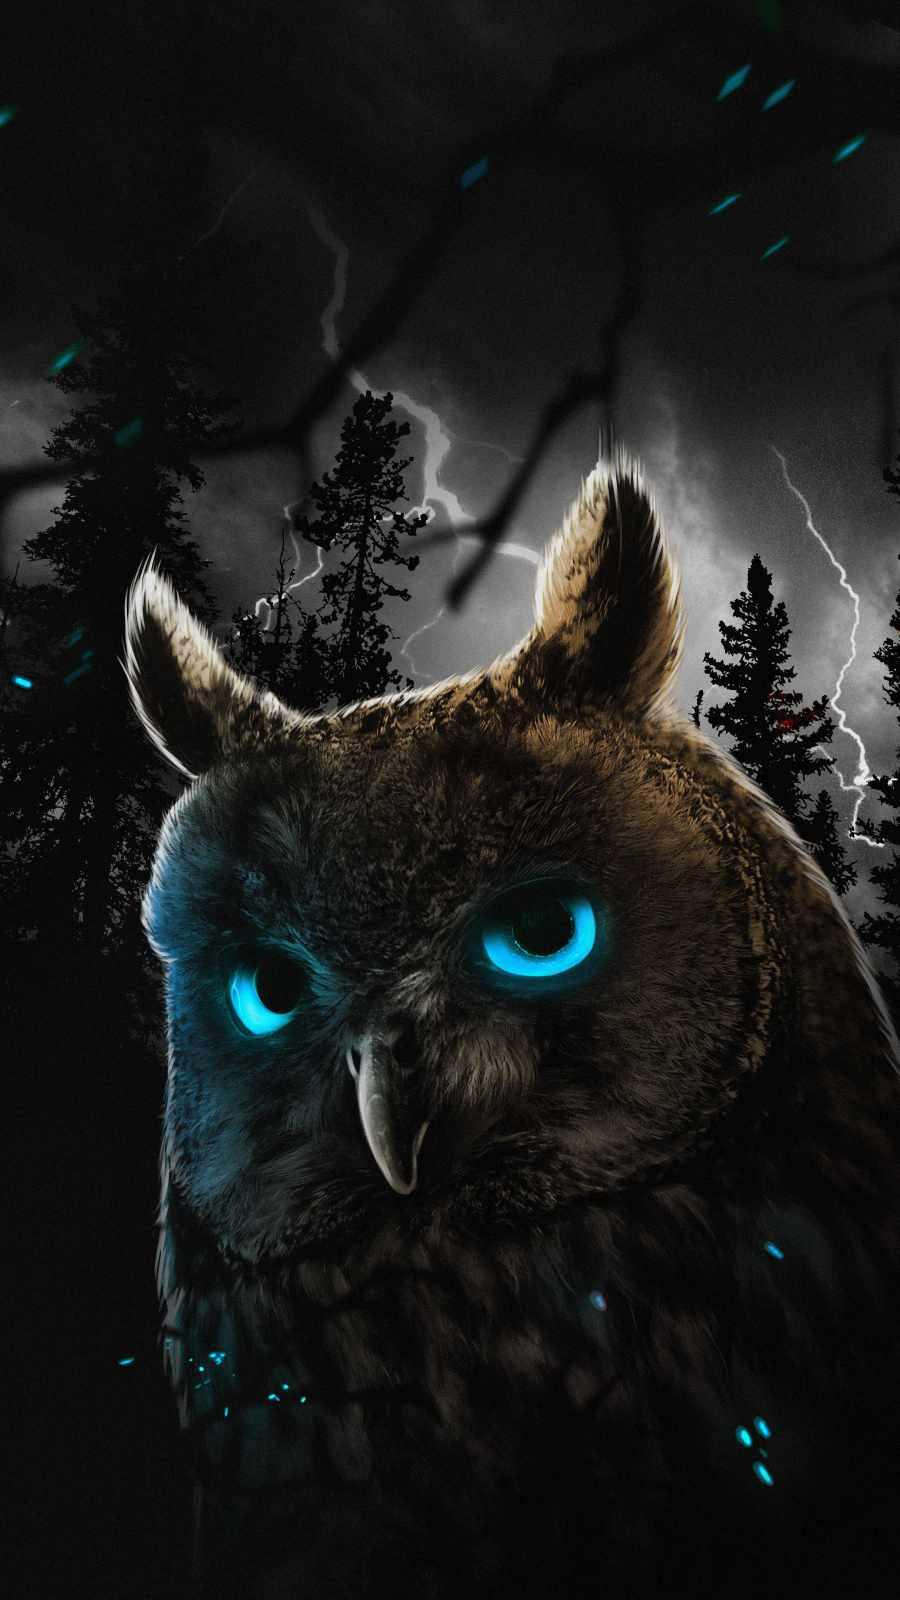 Mystic Owl iPhone Wallpaper